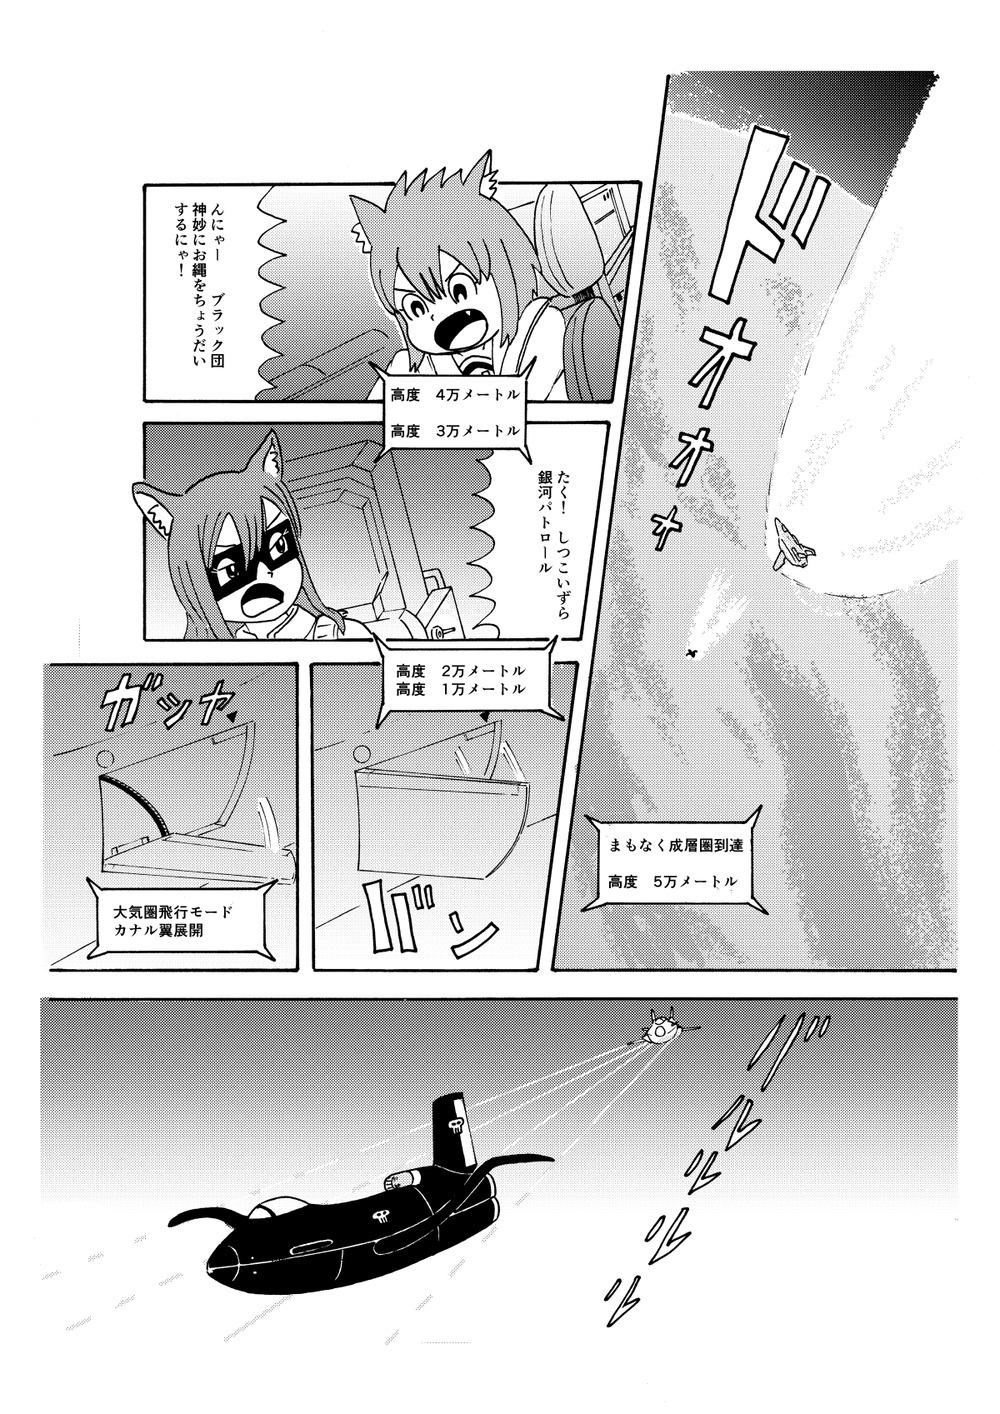 空戦シーン練習